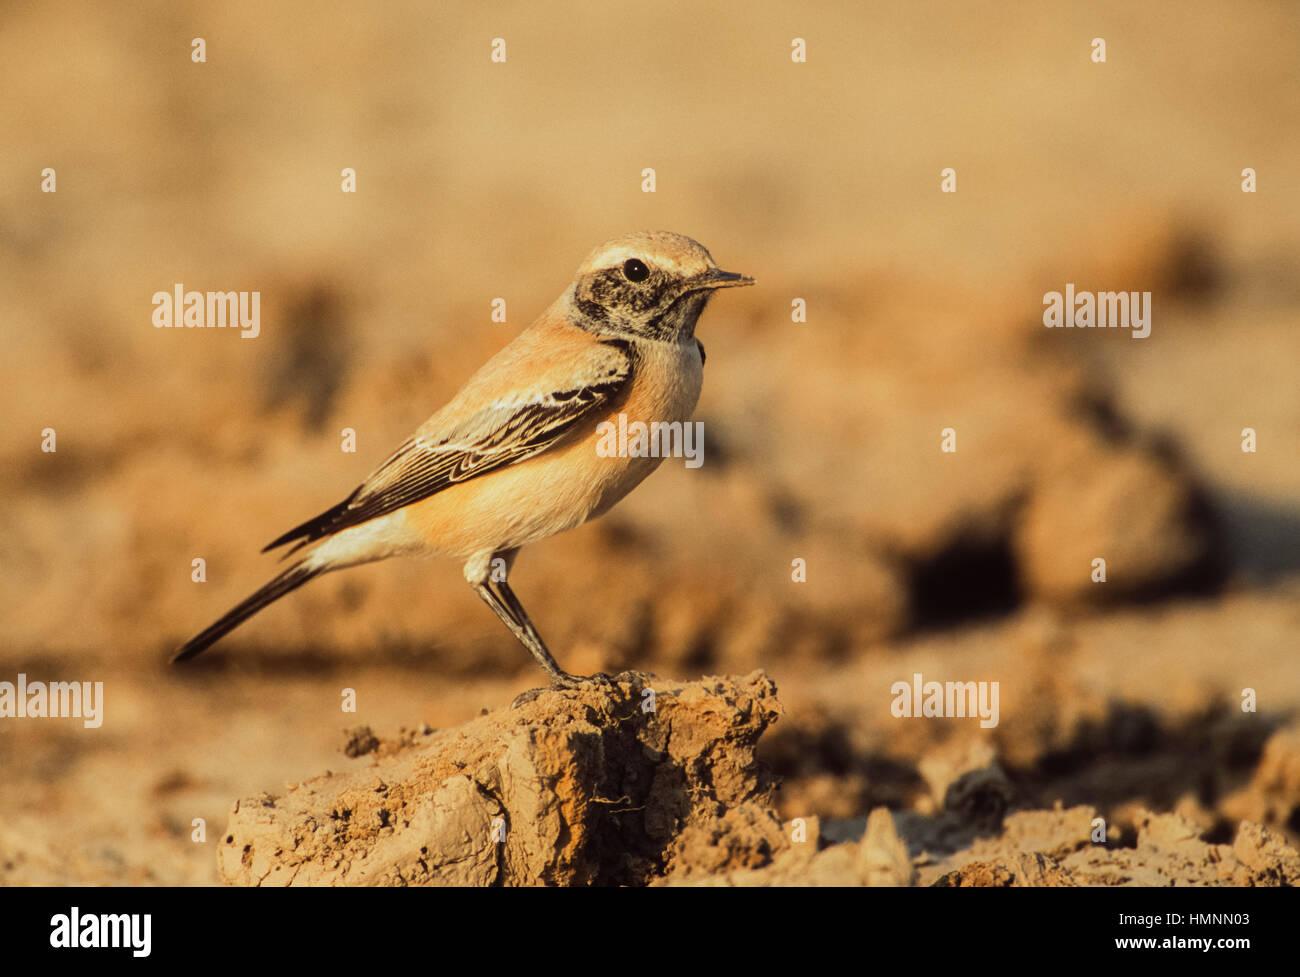 Desert Wheatear, (Oenanthe deserti), male bird with non-breeding plumage, Velavadar National Park,Velavadar,Gujarat,India - Stock Image